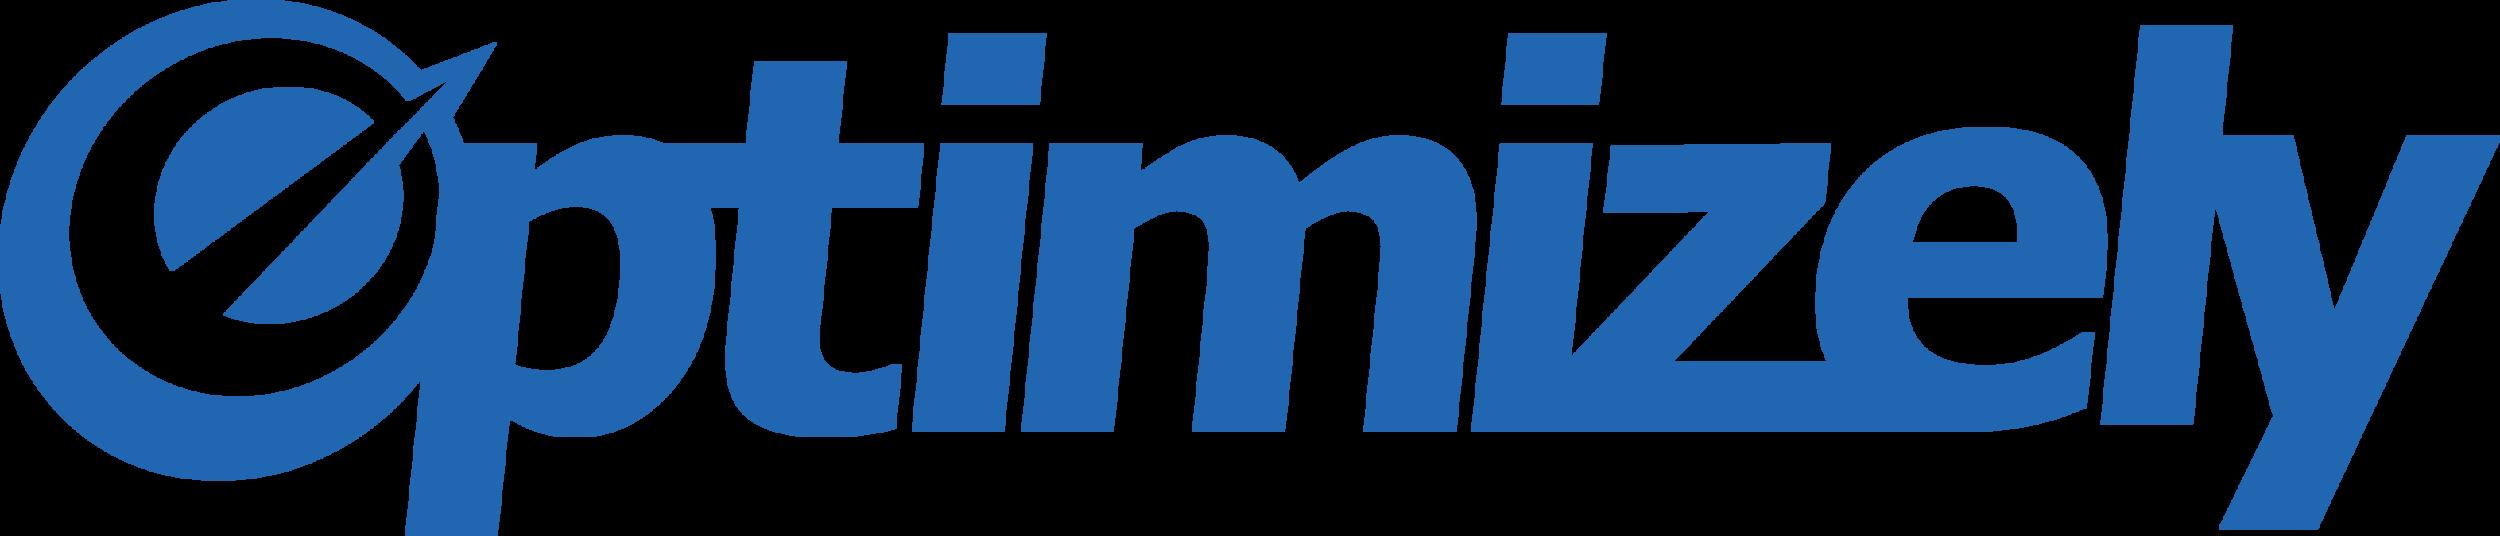 optimizely_logo_BLUE.png